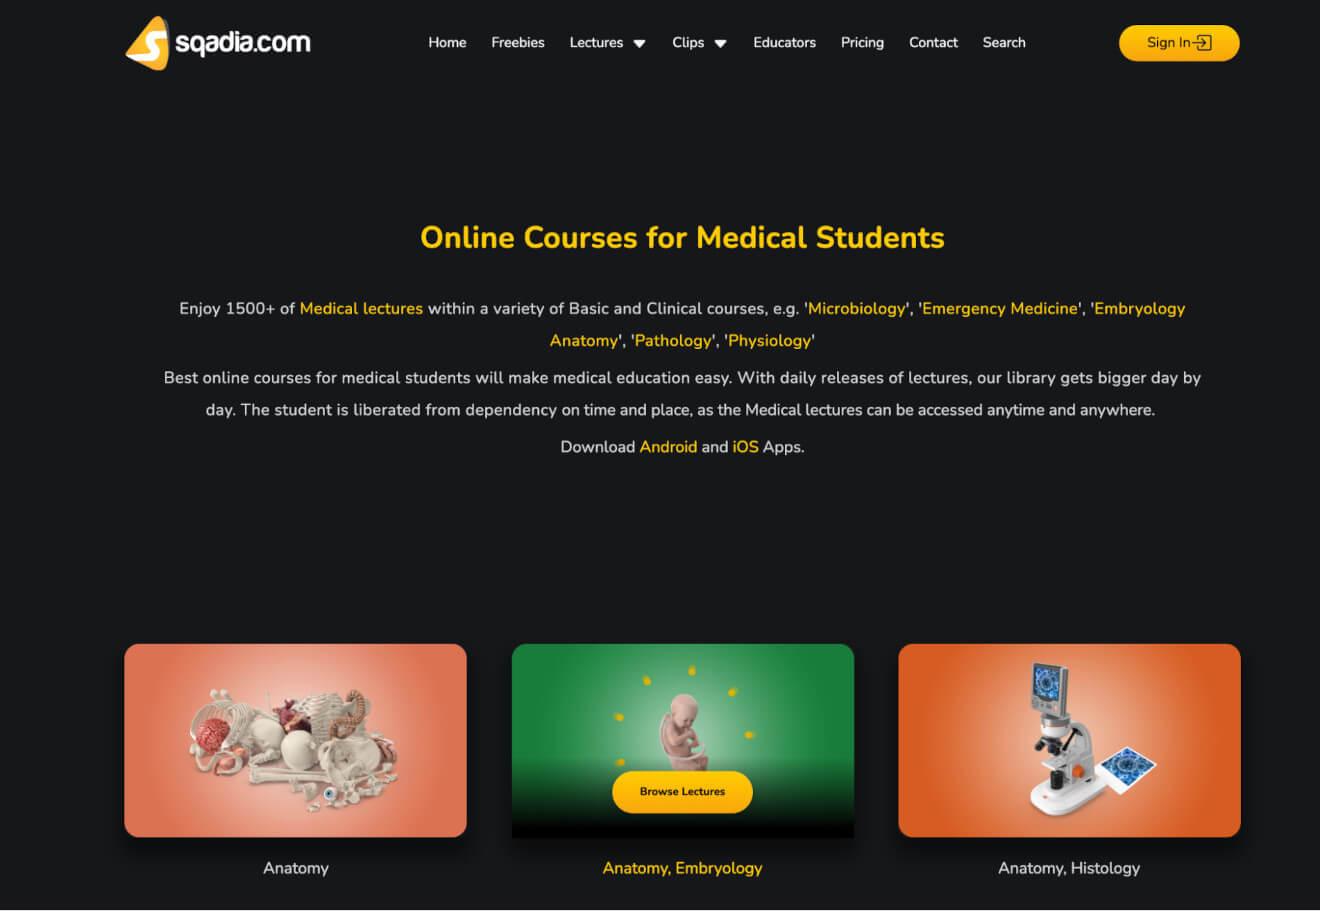 sqadia online courses categories